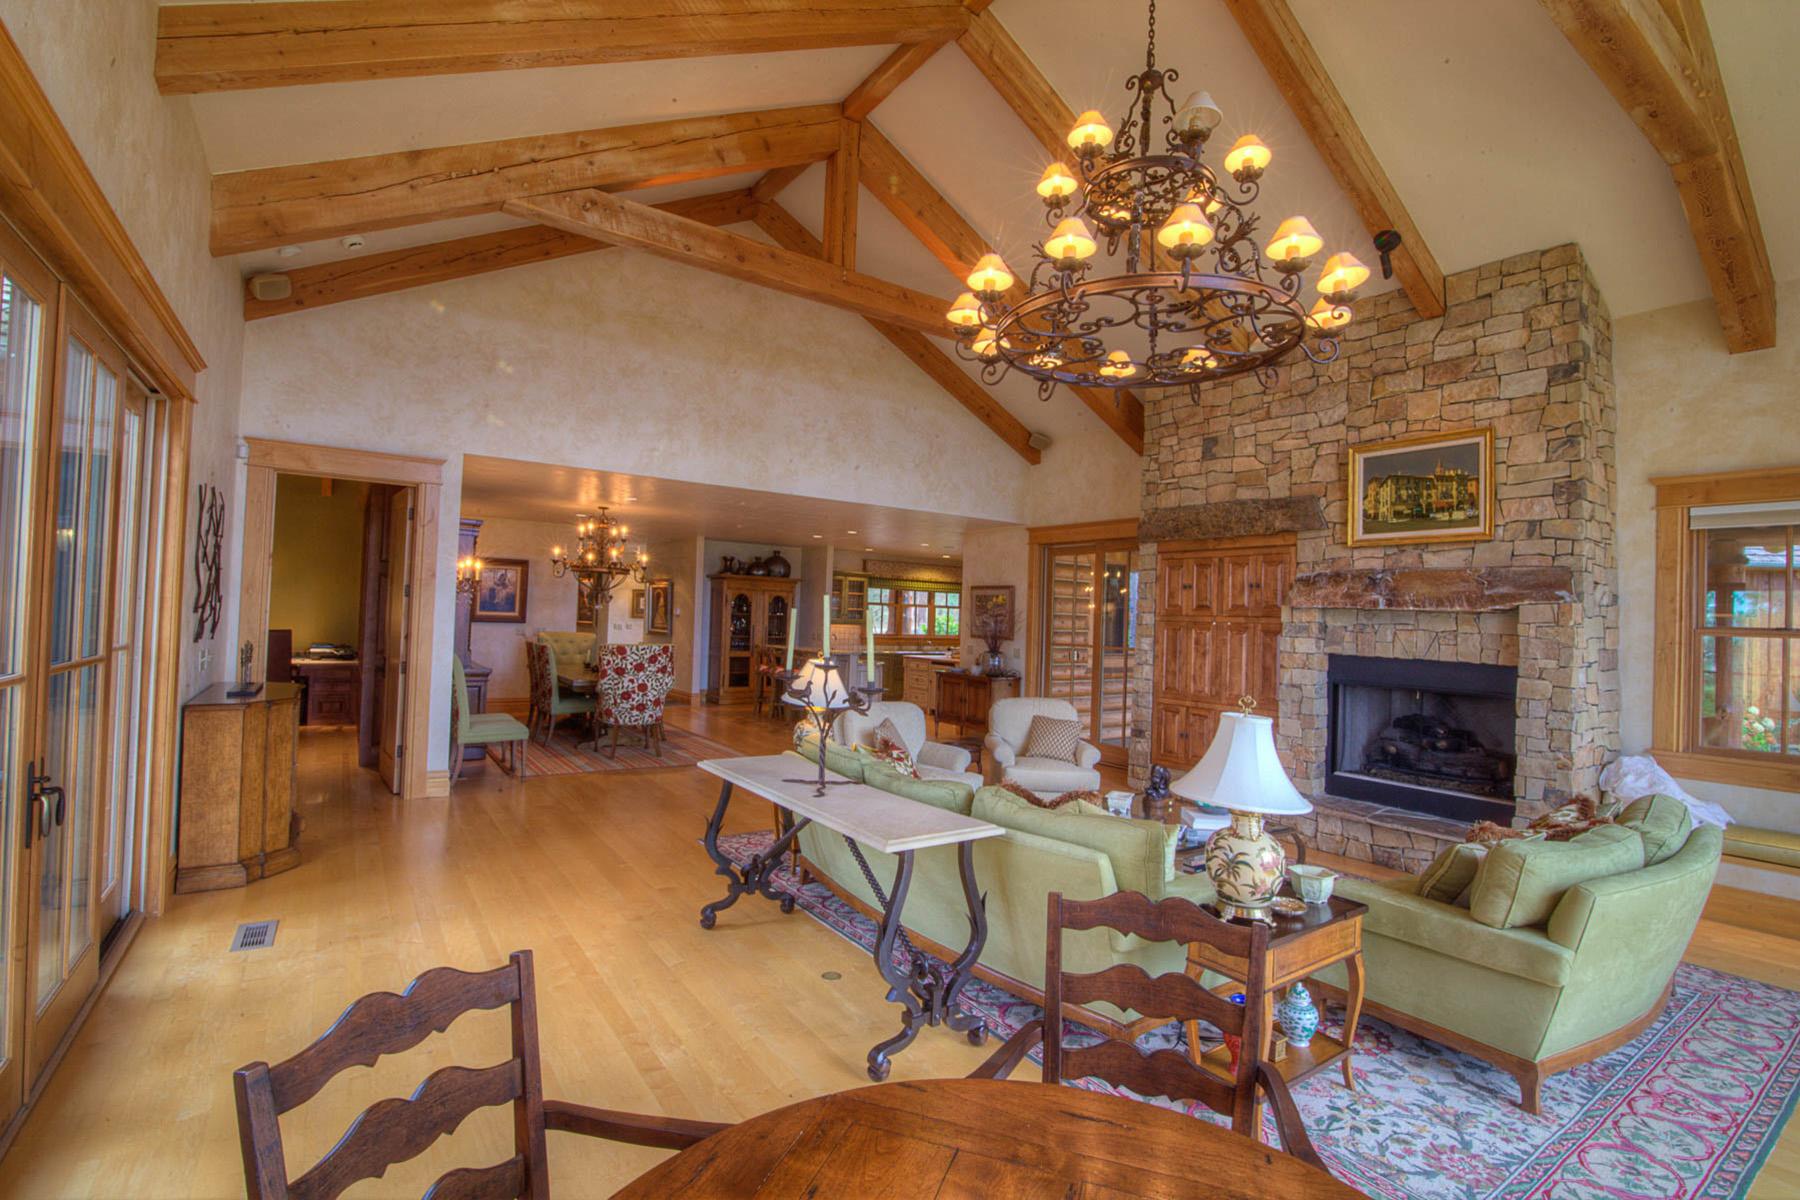 Additional photo for property listing at 1461 Stock Farm Road 1461  Stock Farm Rd Hamilton, Montana 59840 United States